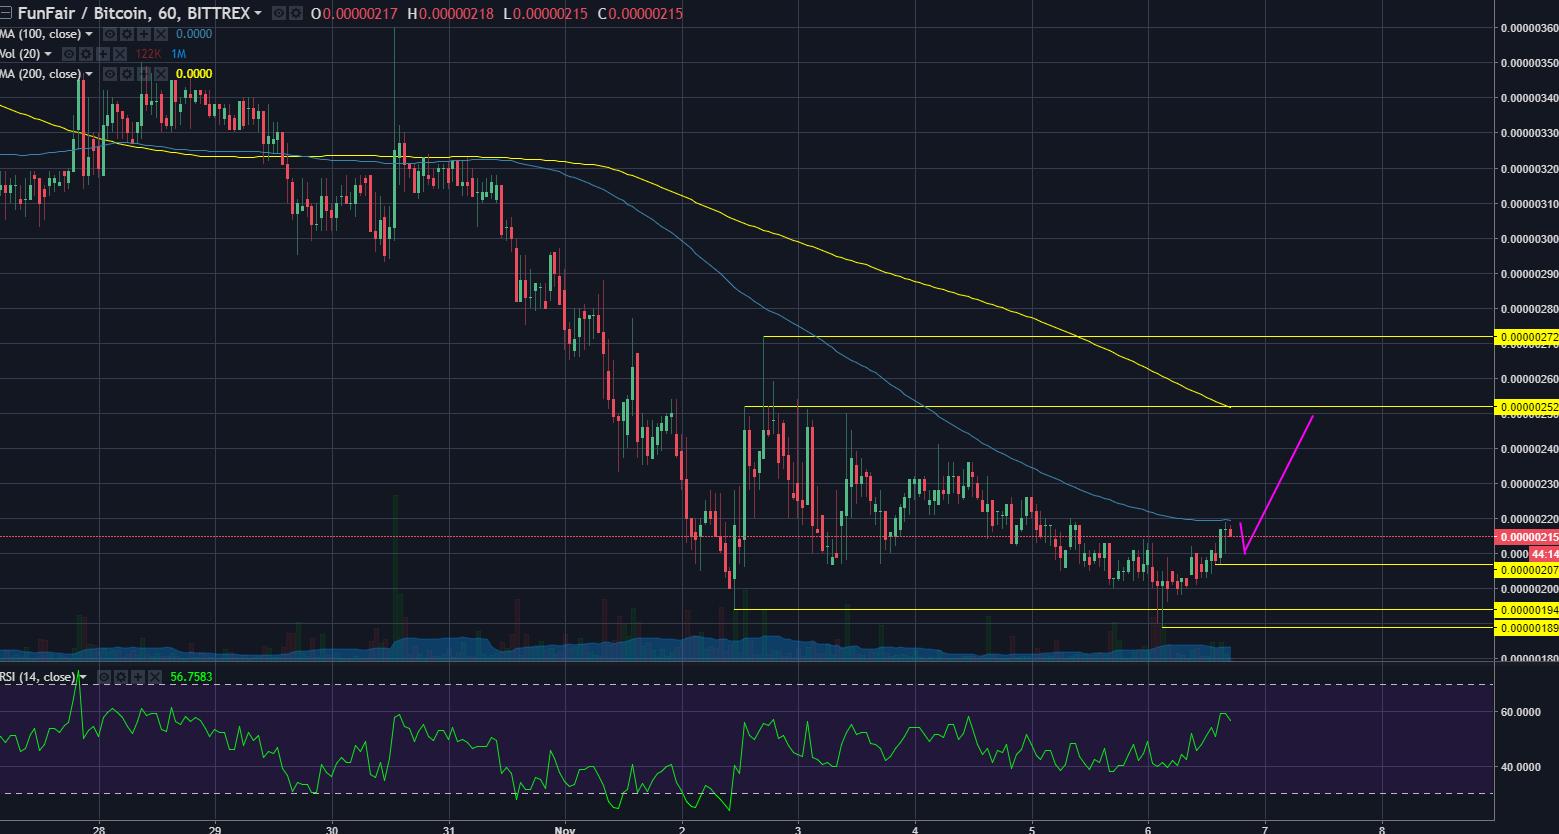 courtesy of Tradingview: Bittrex